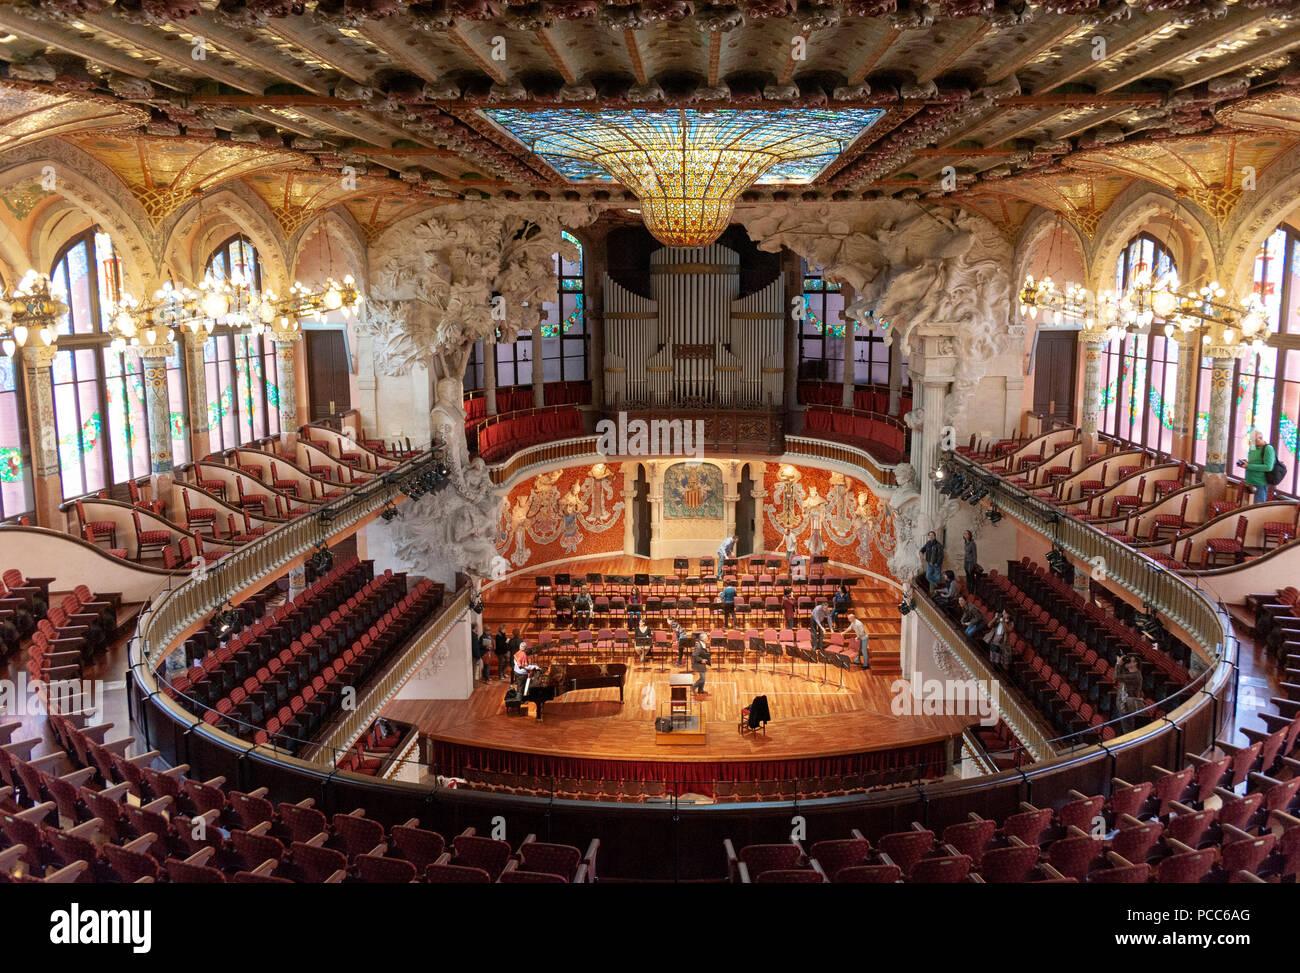 Barcellona, Palau de la Musica Catalana. Modernisme, Palast der katalanischen Musik, Barcellona, Katalonien, Spanien. Erbaut 1905 - 1908 von Lluis Domen Foto Stock